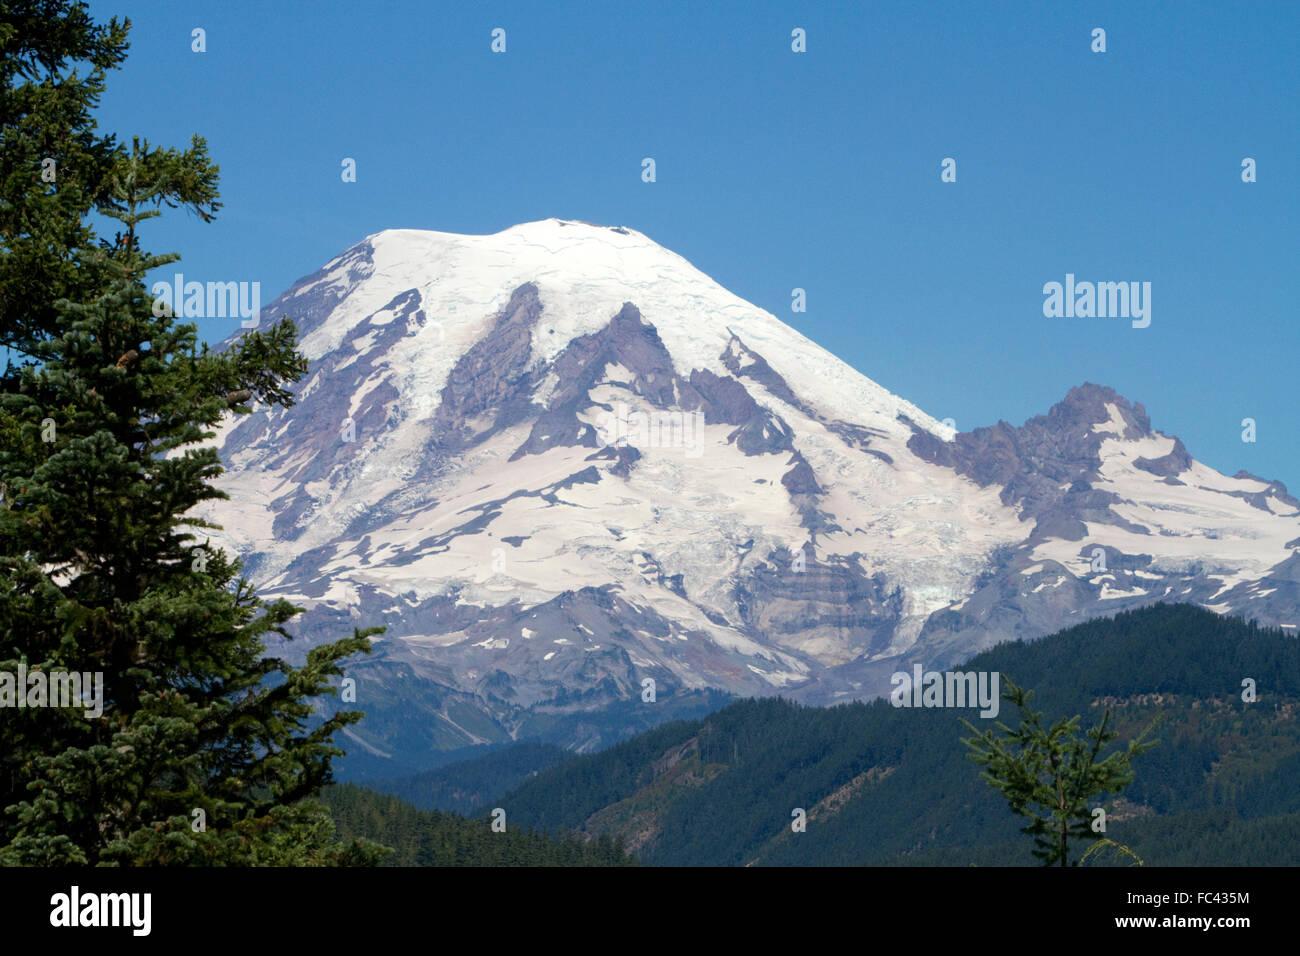 Mount Rainier in the state of Washington, USA. - Stock Image